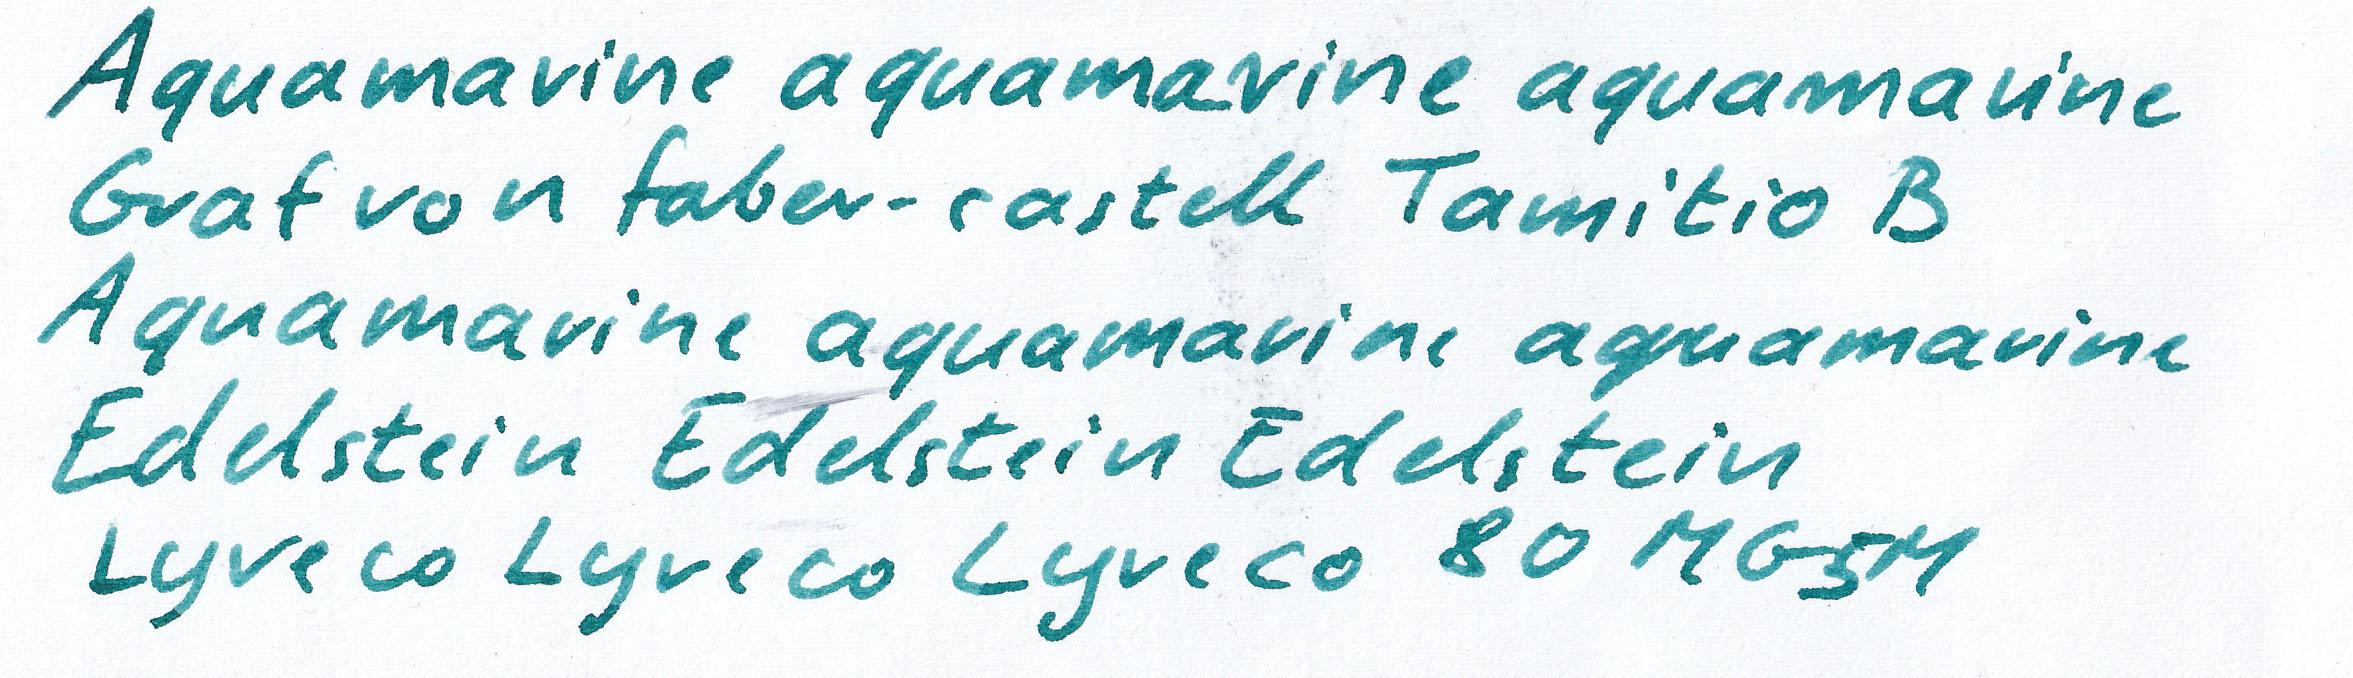 fpn_1463980748__aquamarine_poljet.jpg